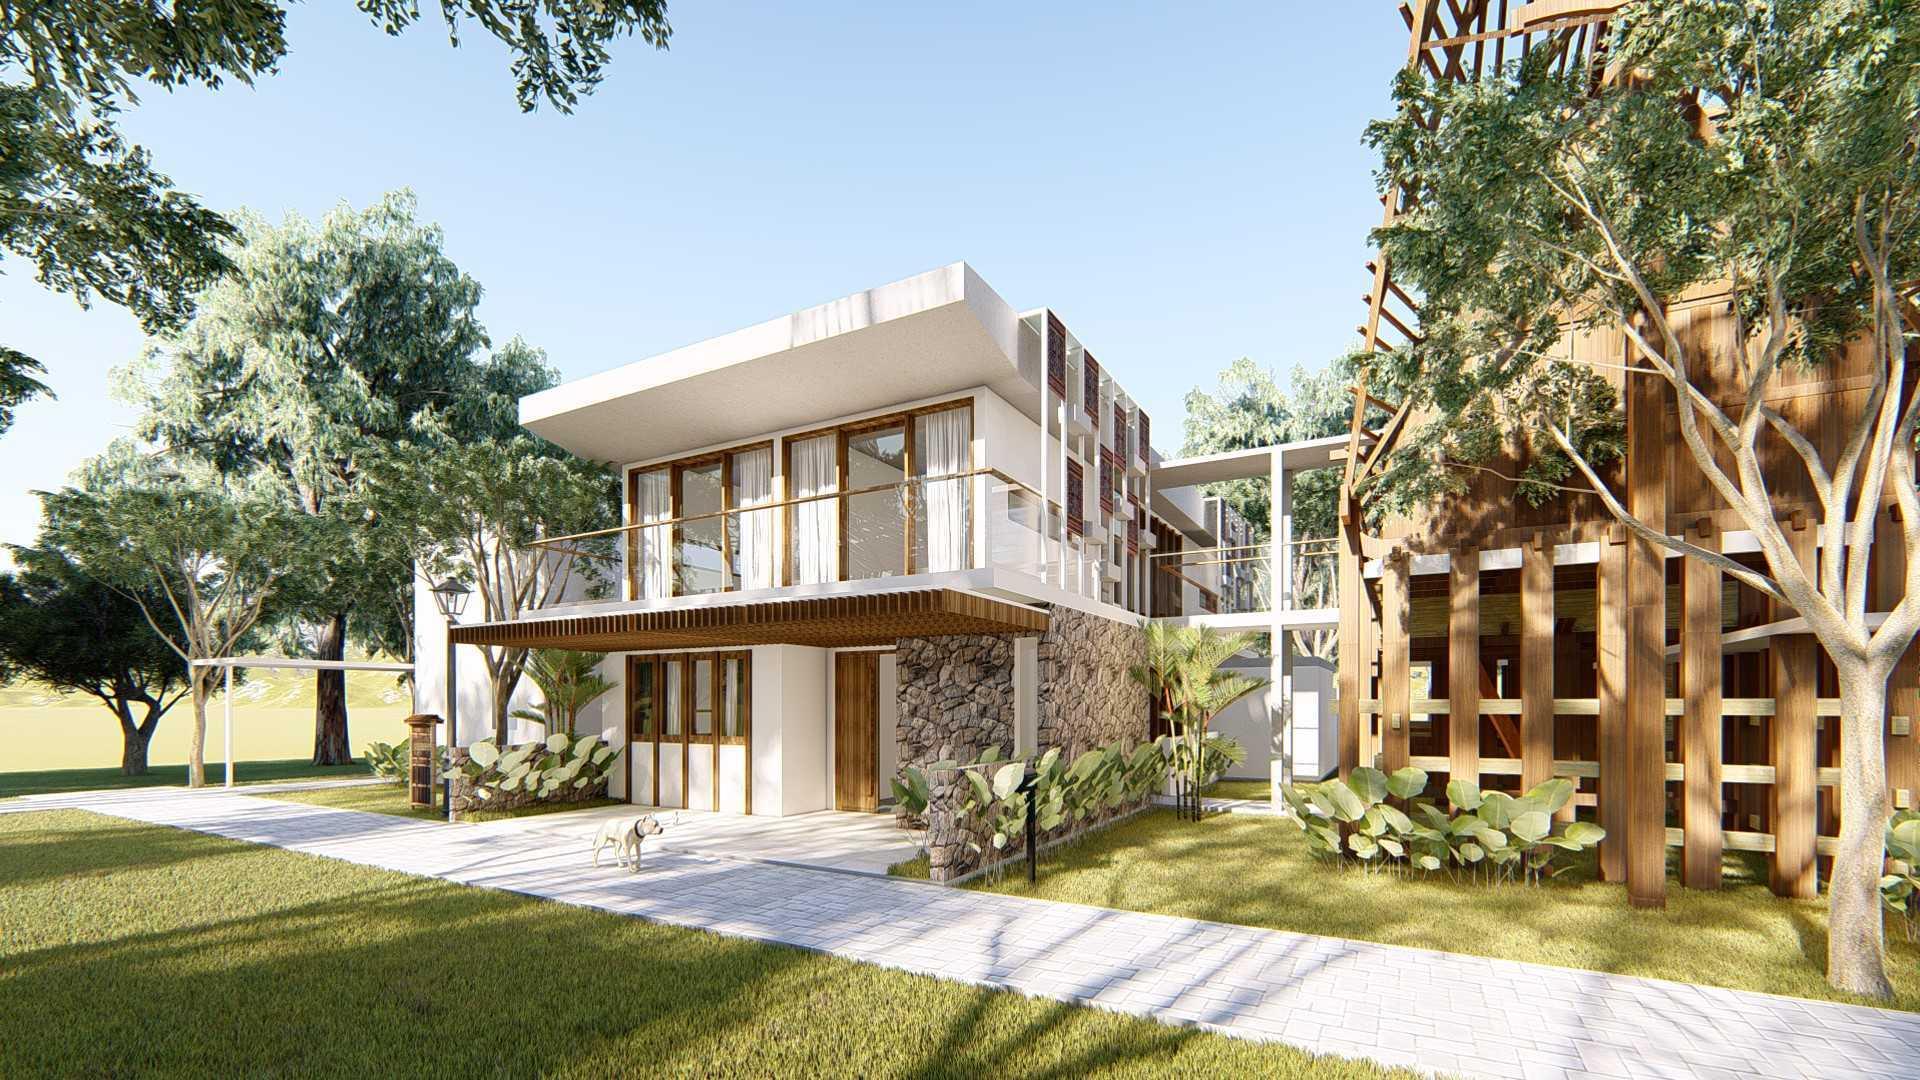 Jasa Arsitek guntur haryadi architecture studio di Sulawesi